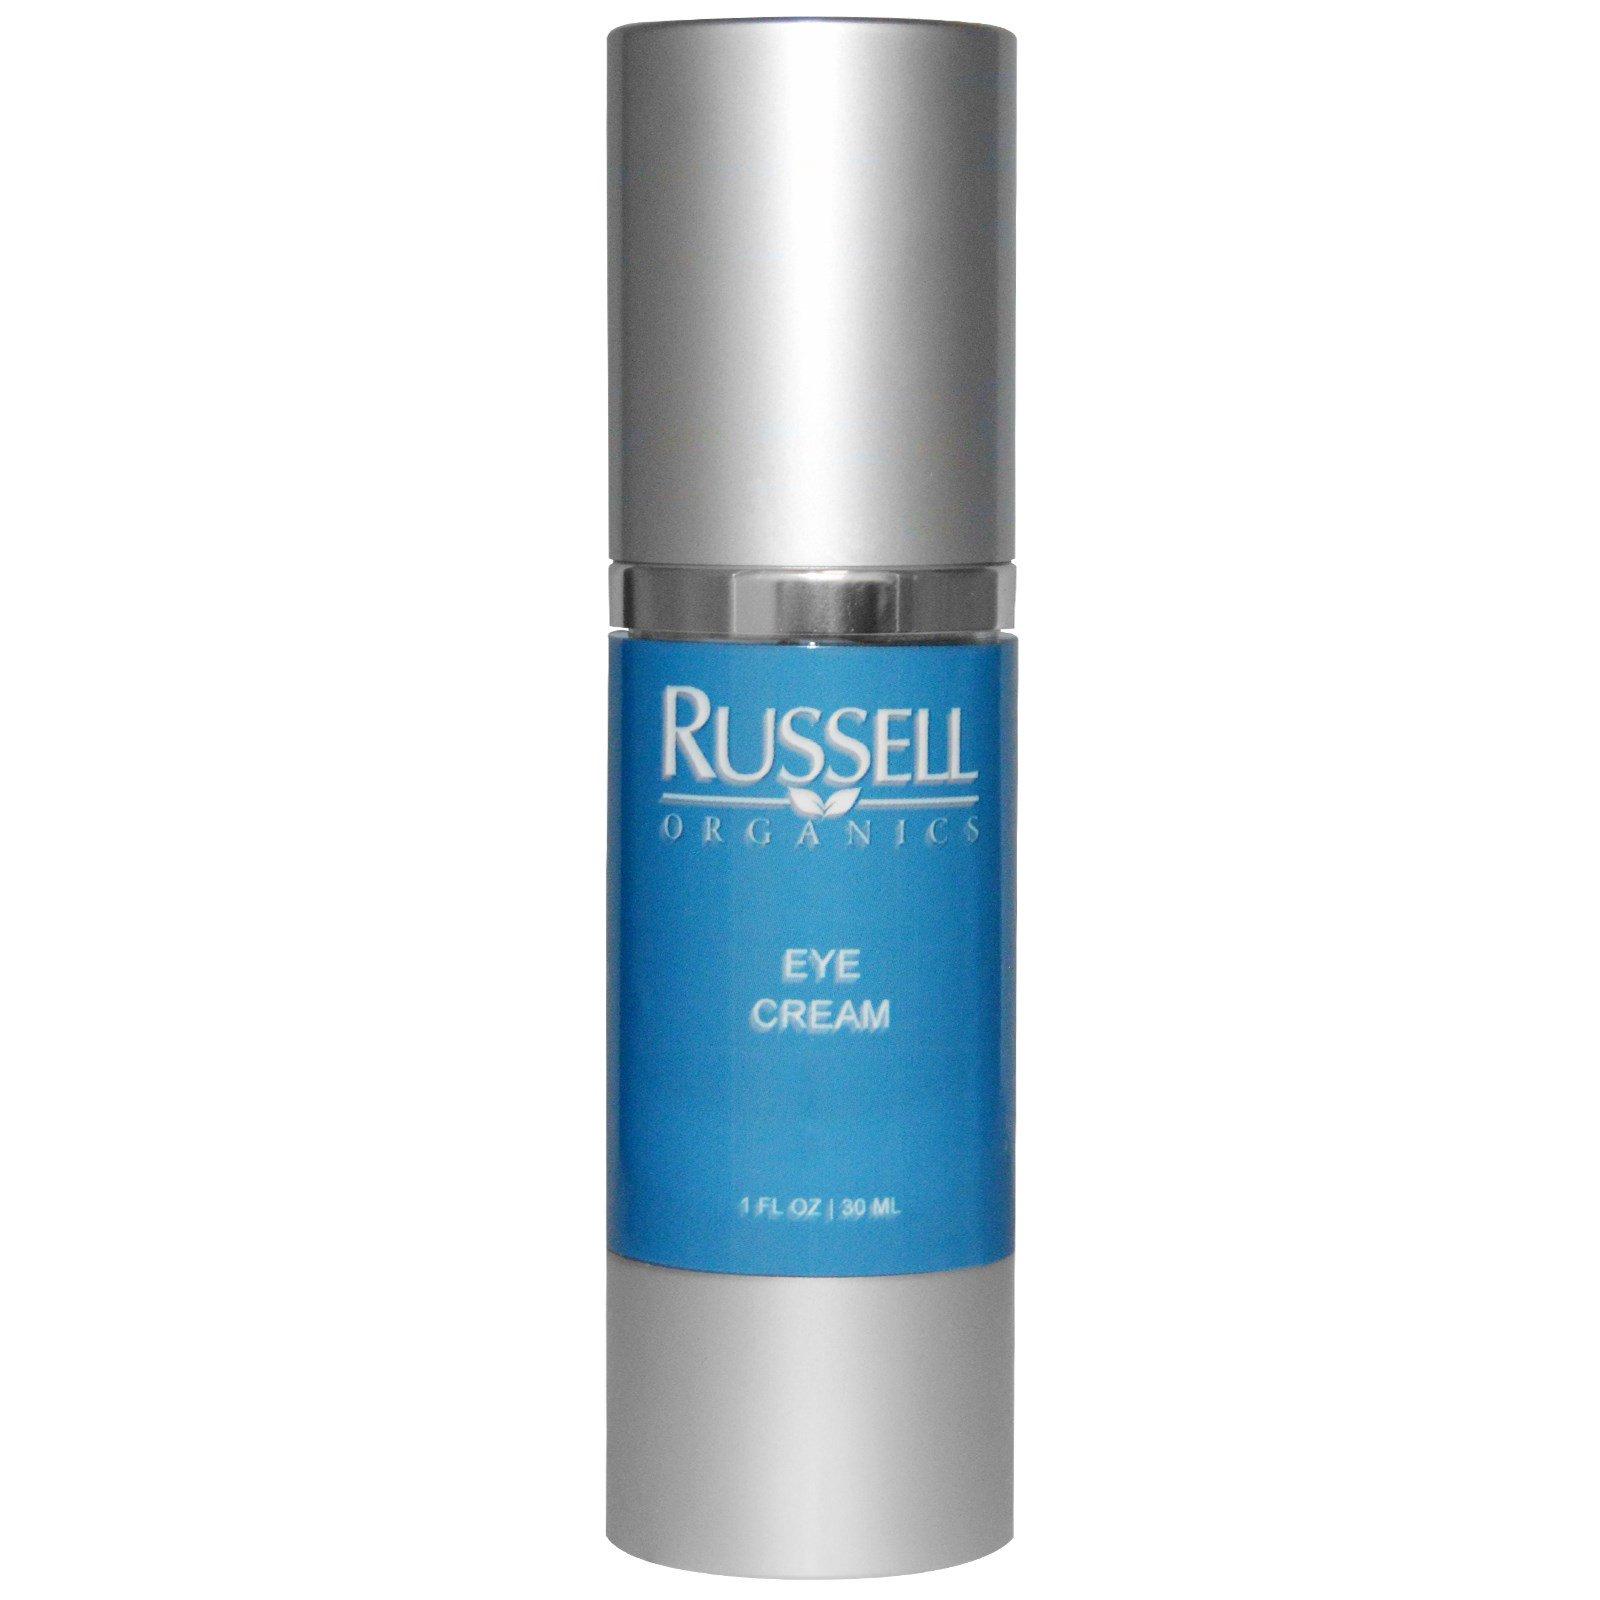 Russell Organics, Крем для кожи вокруг глаз, 1 жидка унция (30 мл)